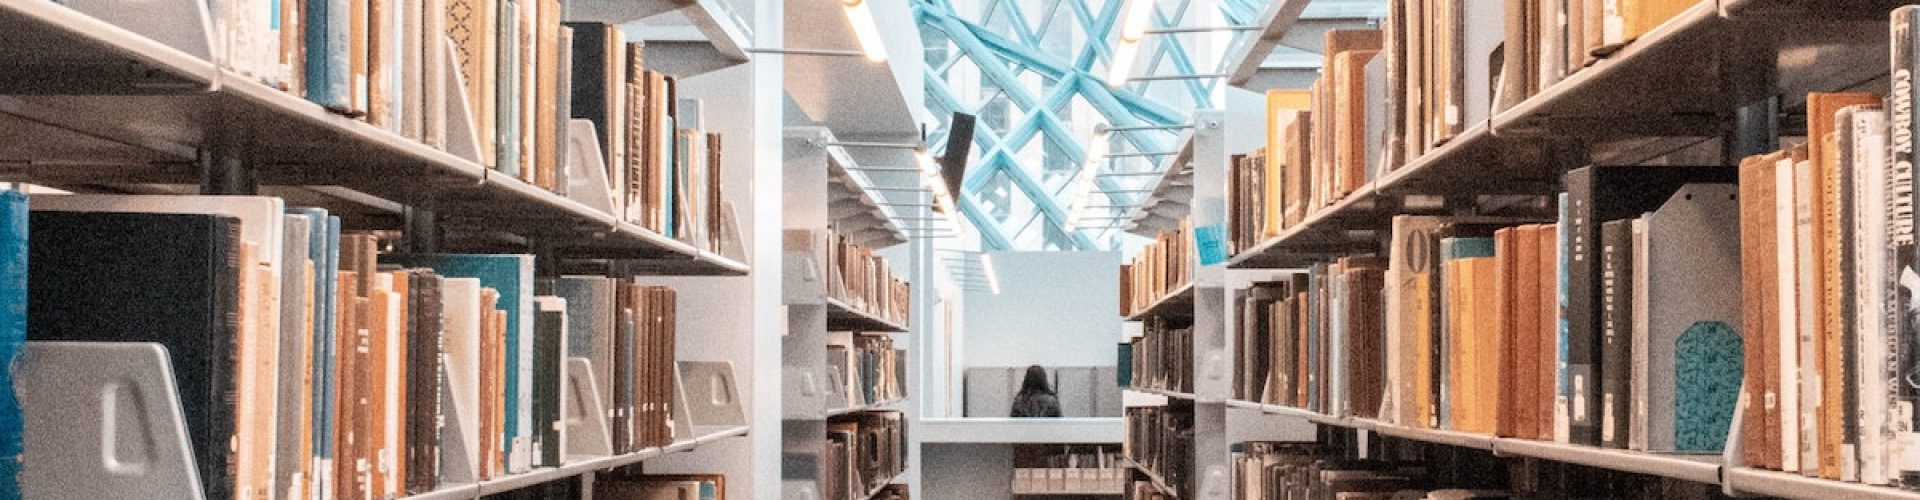 head lice library